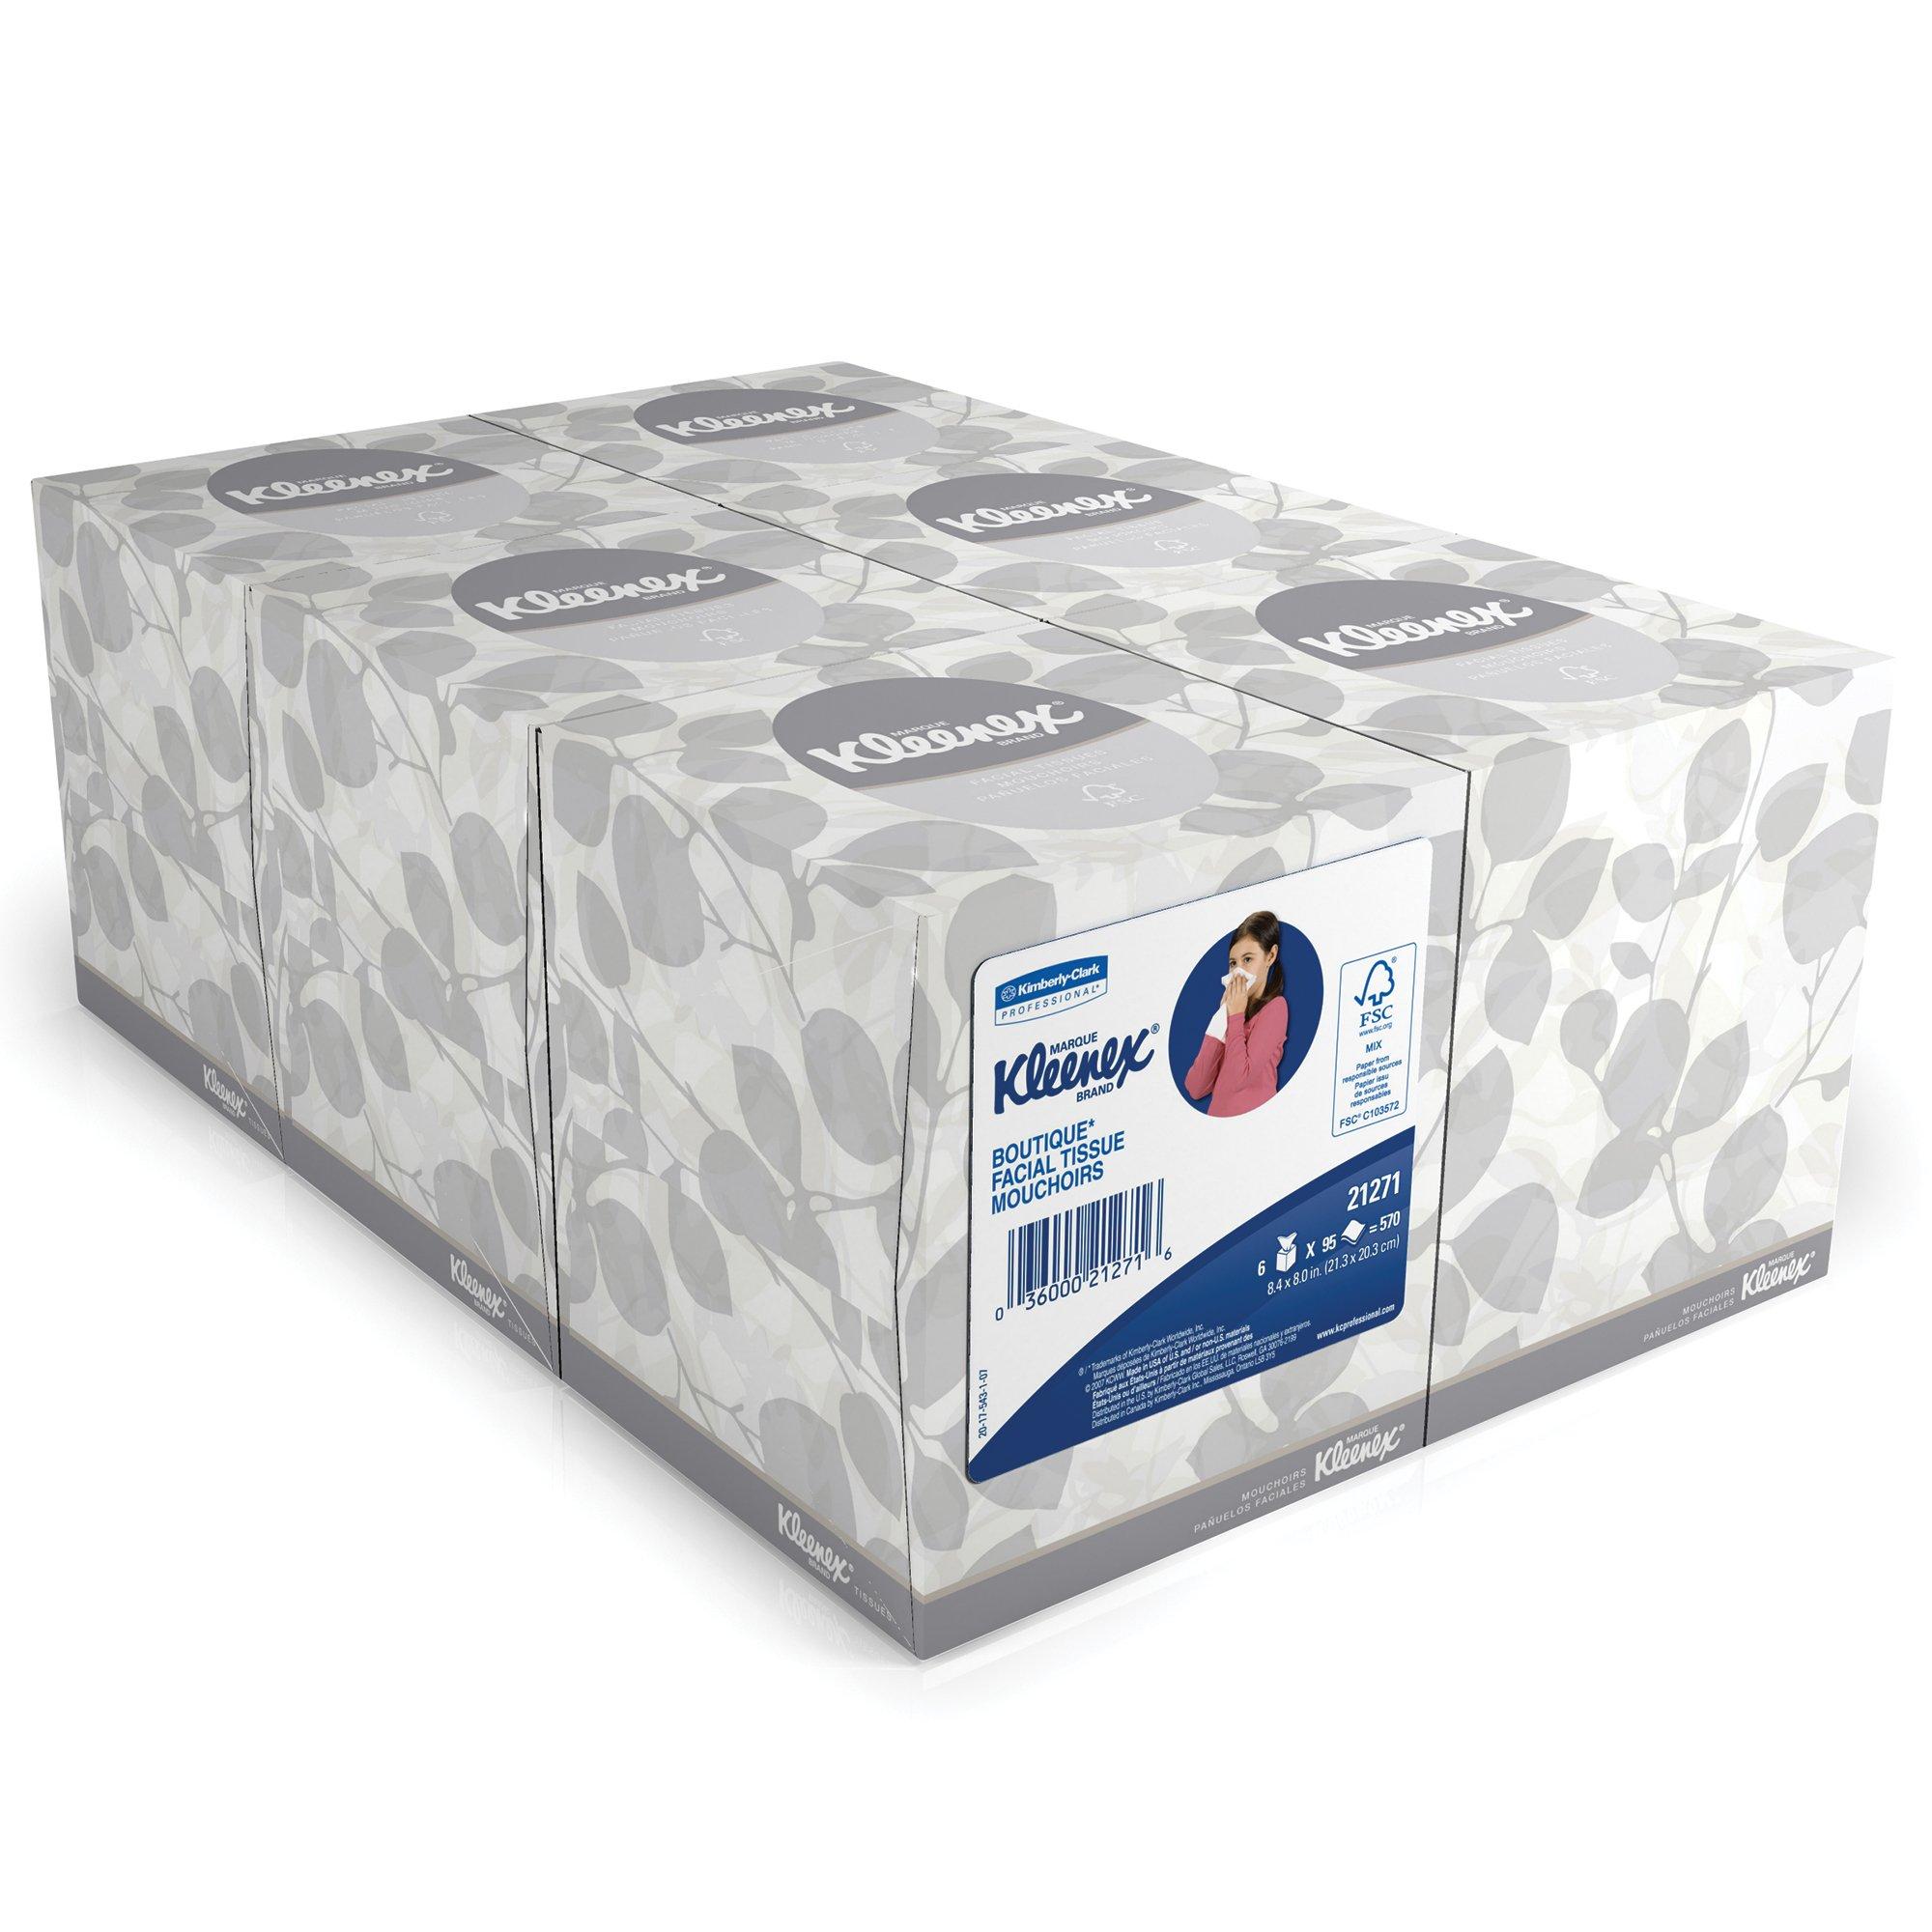 Kleenex Professional Facial Tissue Cube for Business (21271), Upright Face Tissue Box, 6 Bundles/Case, 6 Boxes/Bundle, 36 Boxes/Case